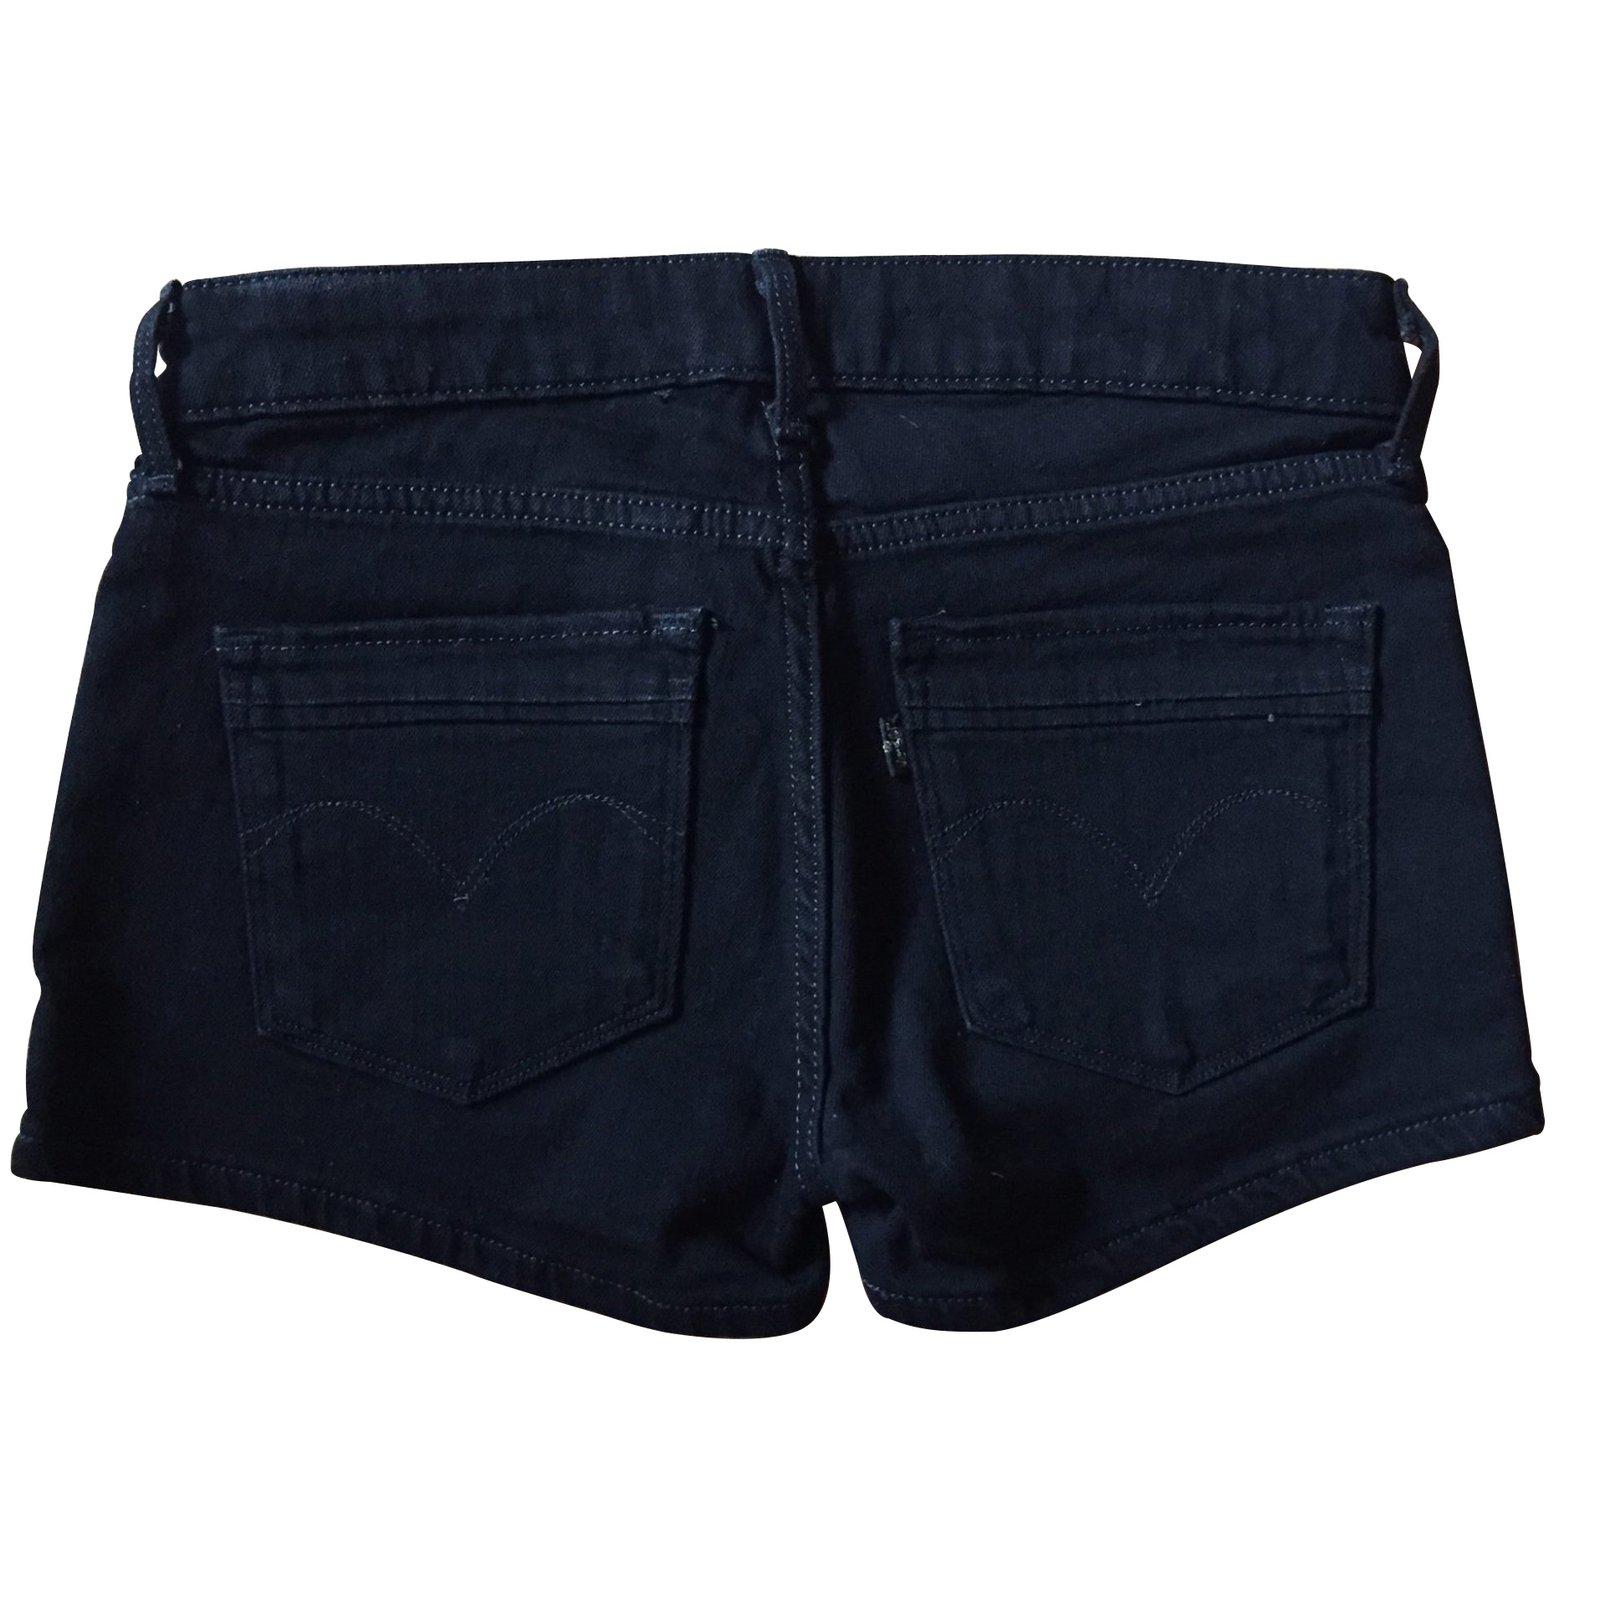 shorts levi 39 s shorts jean noir joli closet. Black Bedroom Furniture Sets. Home Design Ideas